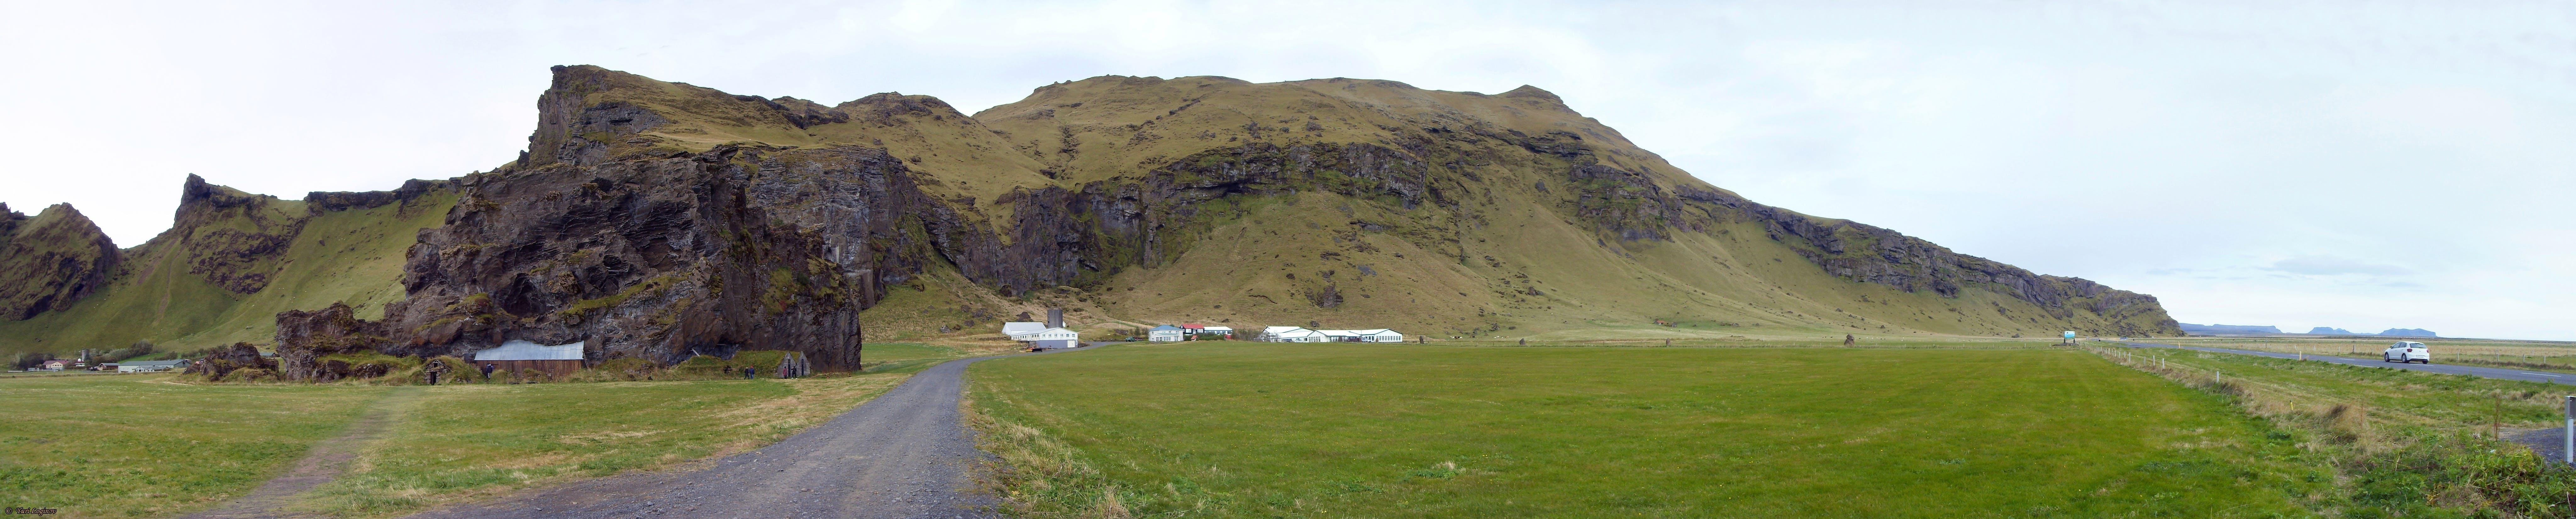 Free stock photo of iceland, Drangshlið